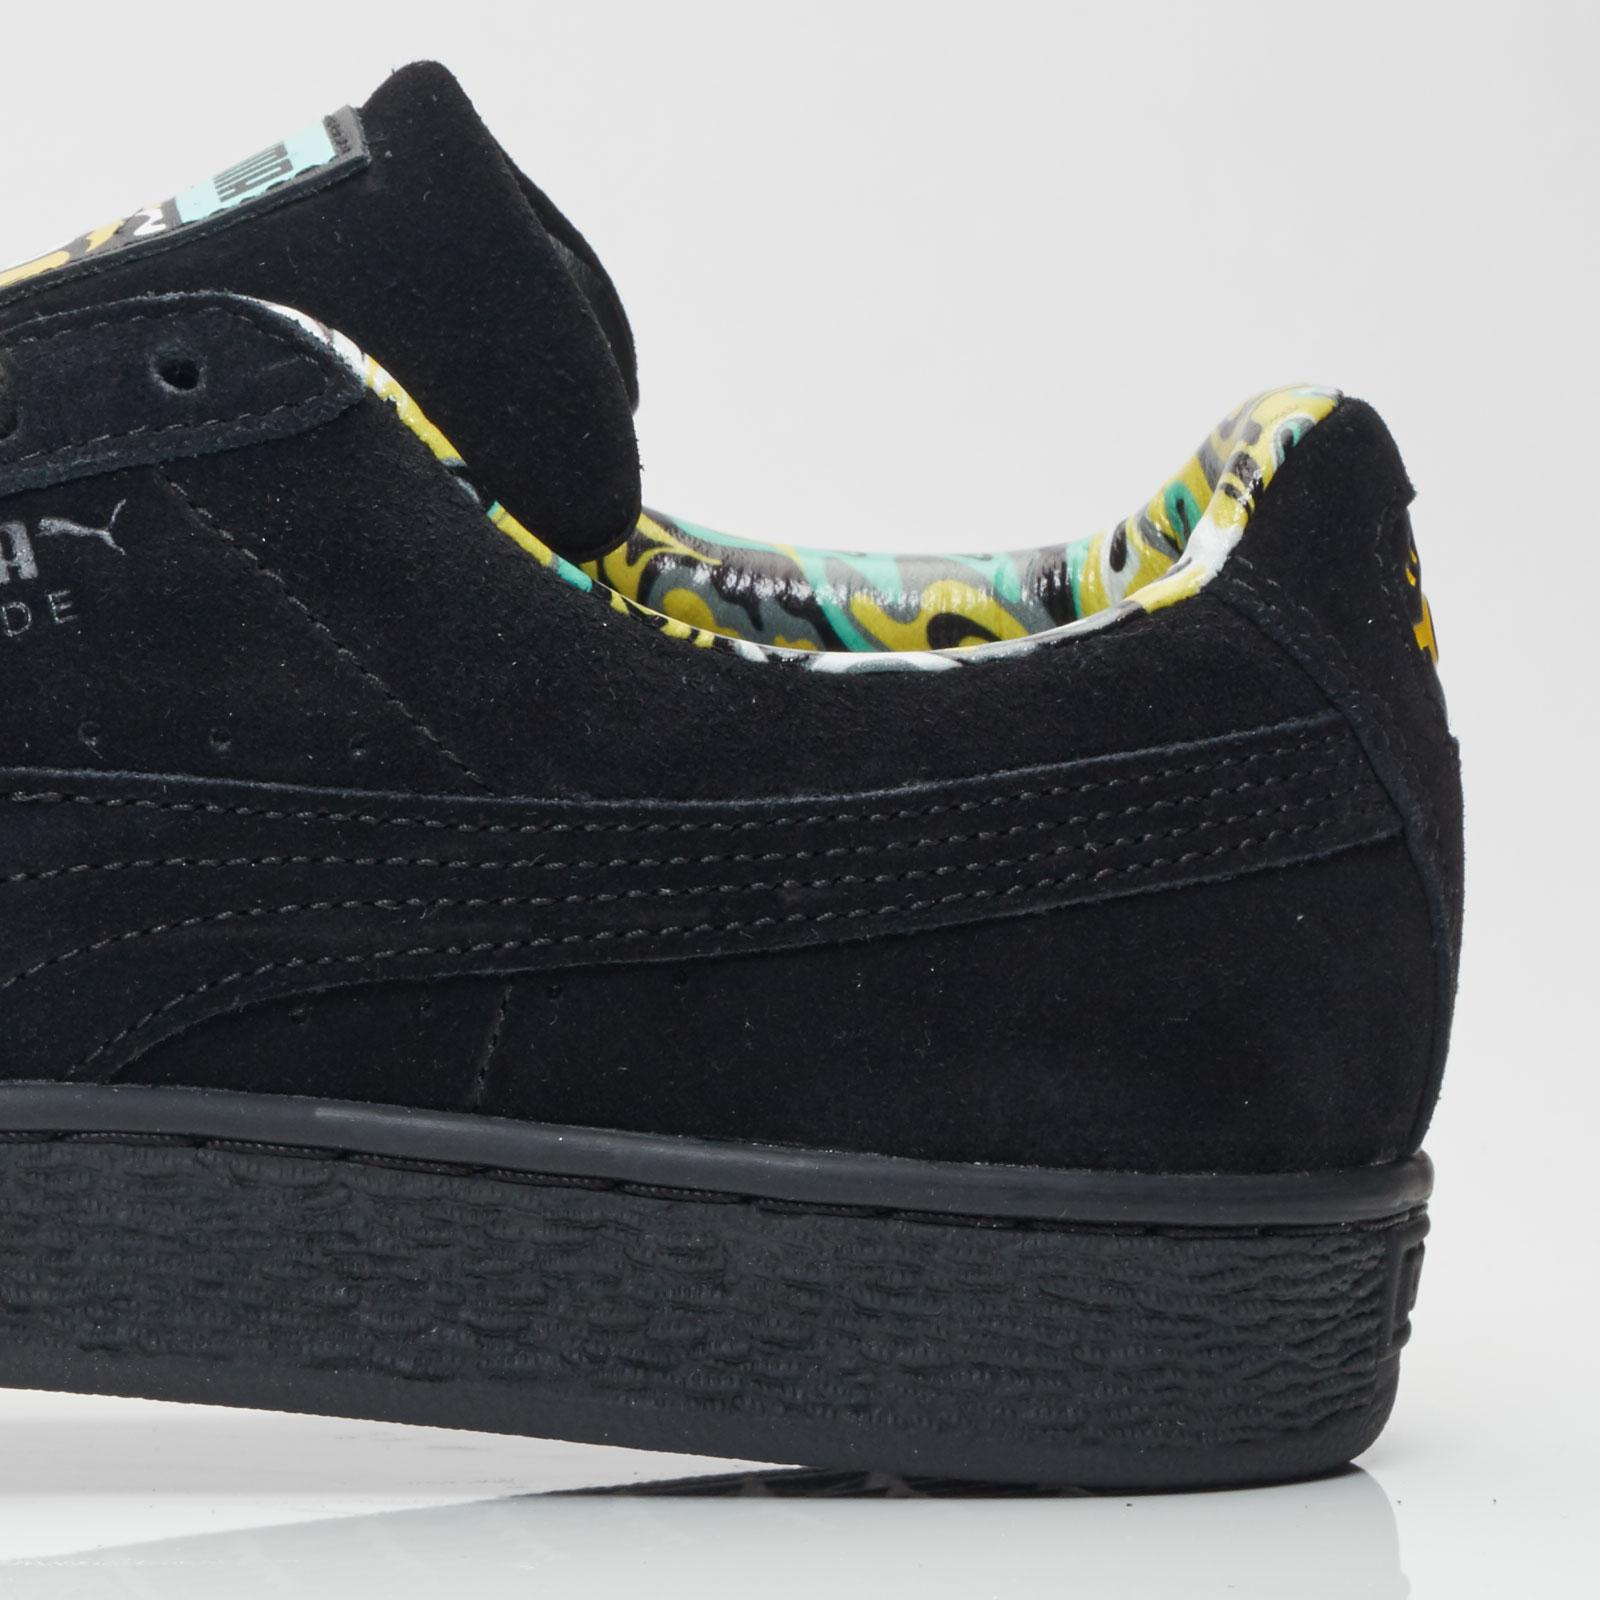 c5522e39a05 Puma X Minions Suede - 365668-01 - Sneakersnstuff